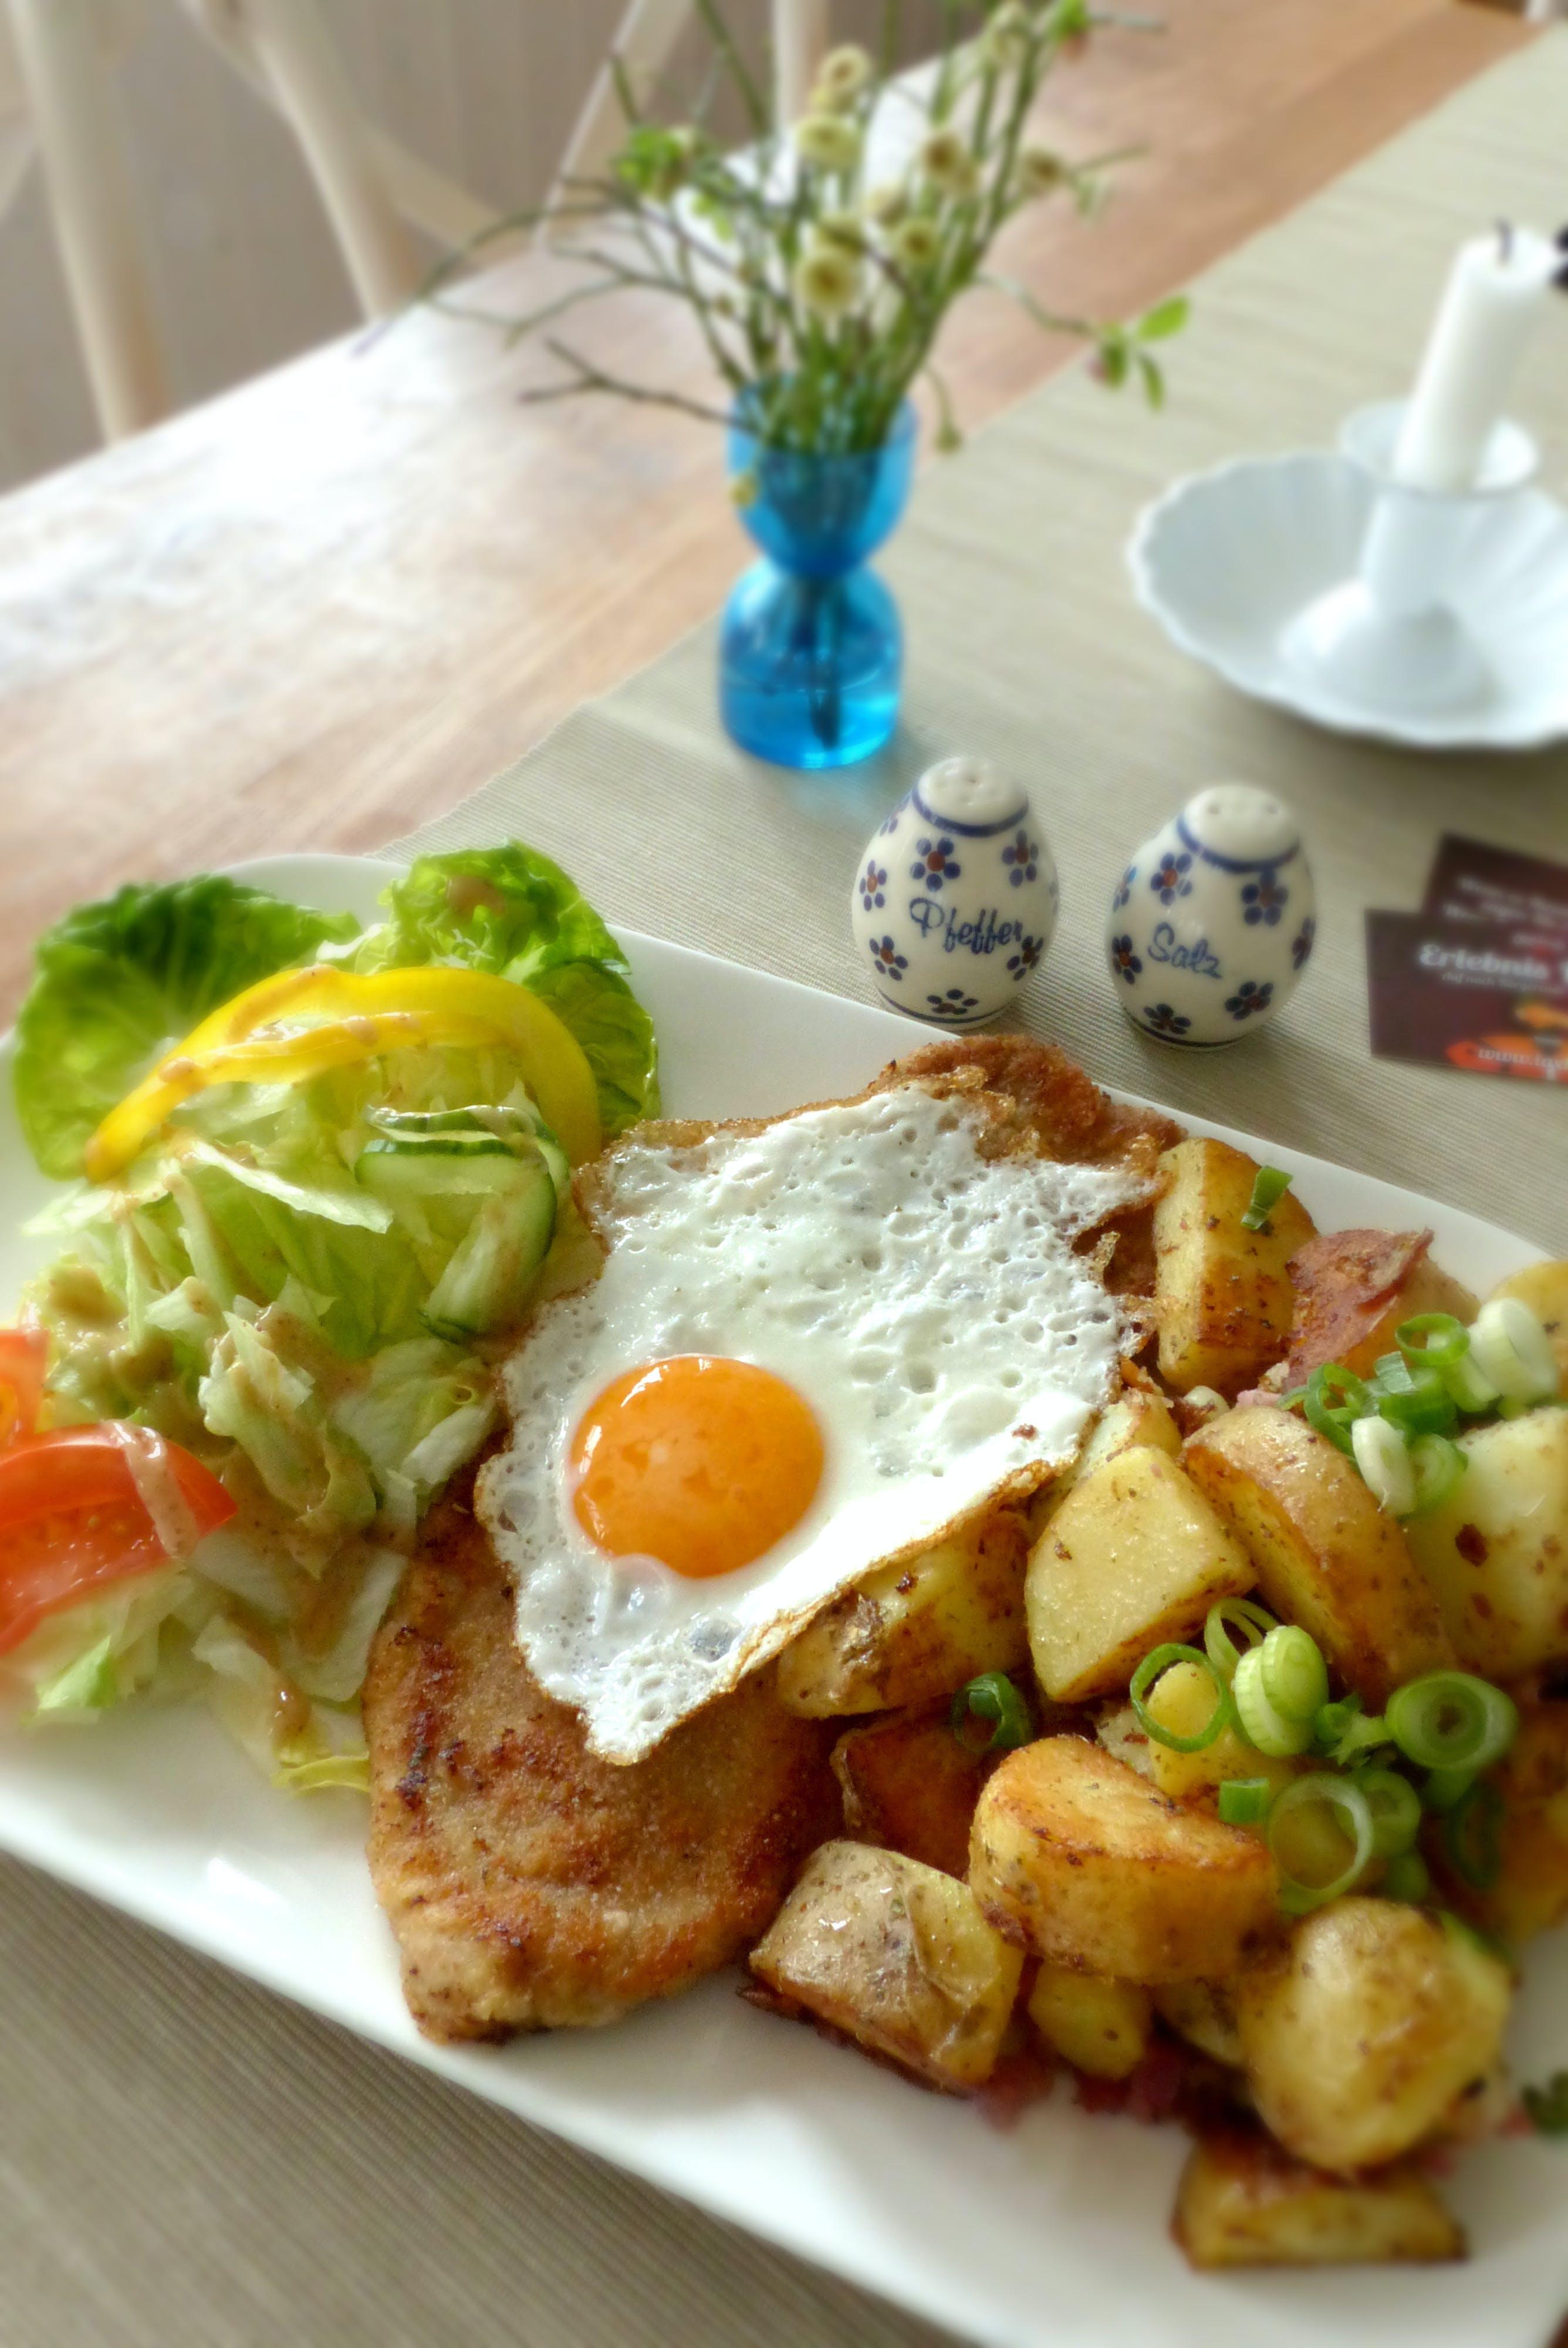 Free stock photo of eating, dish, Fried egg